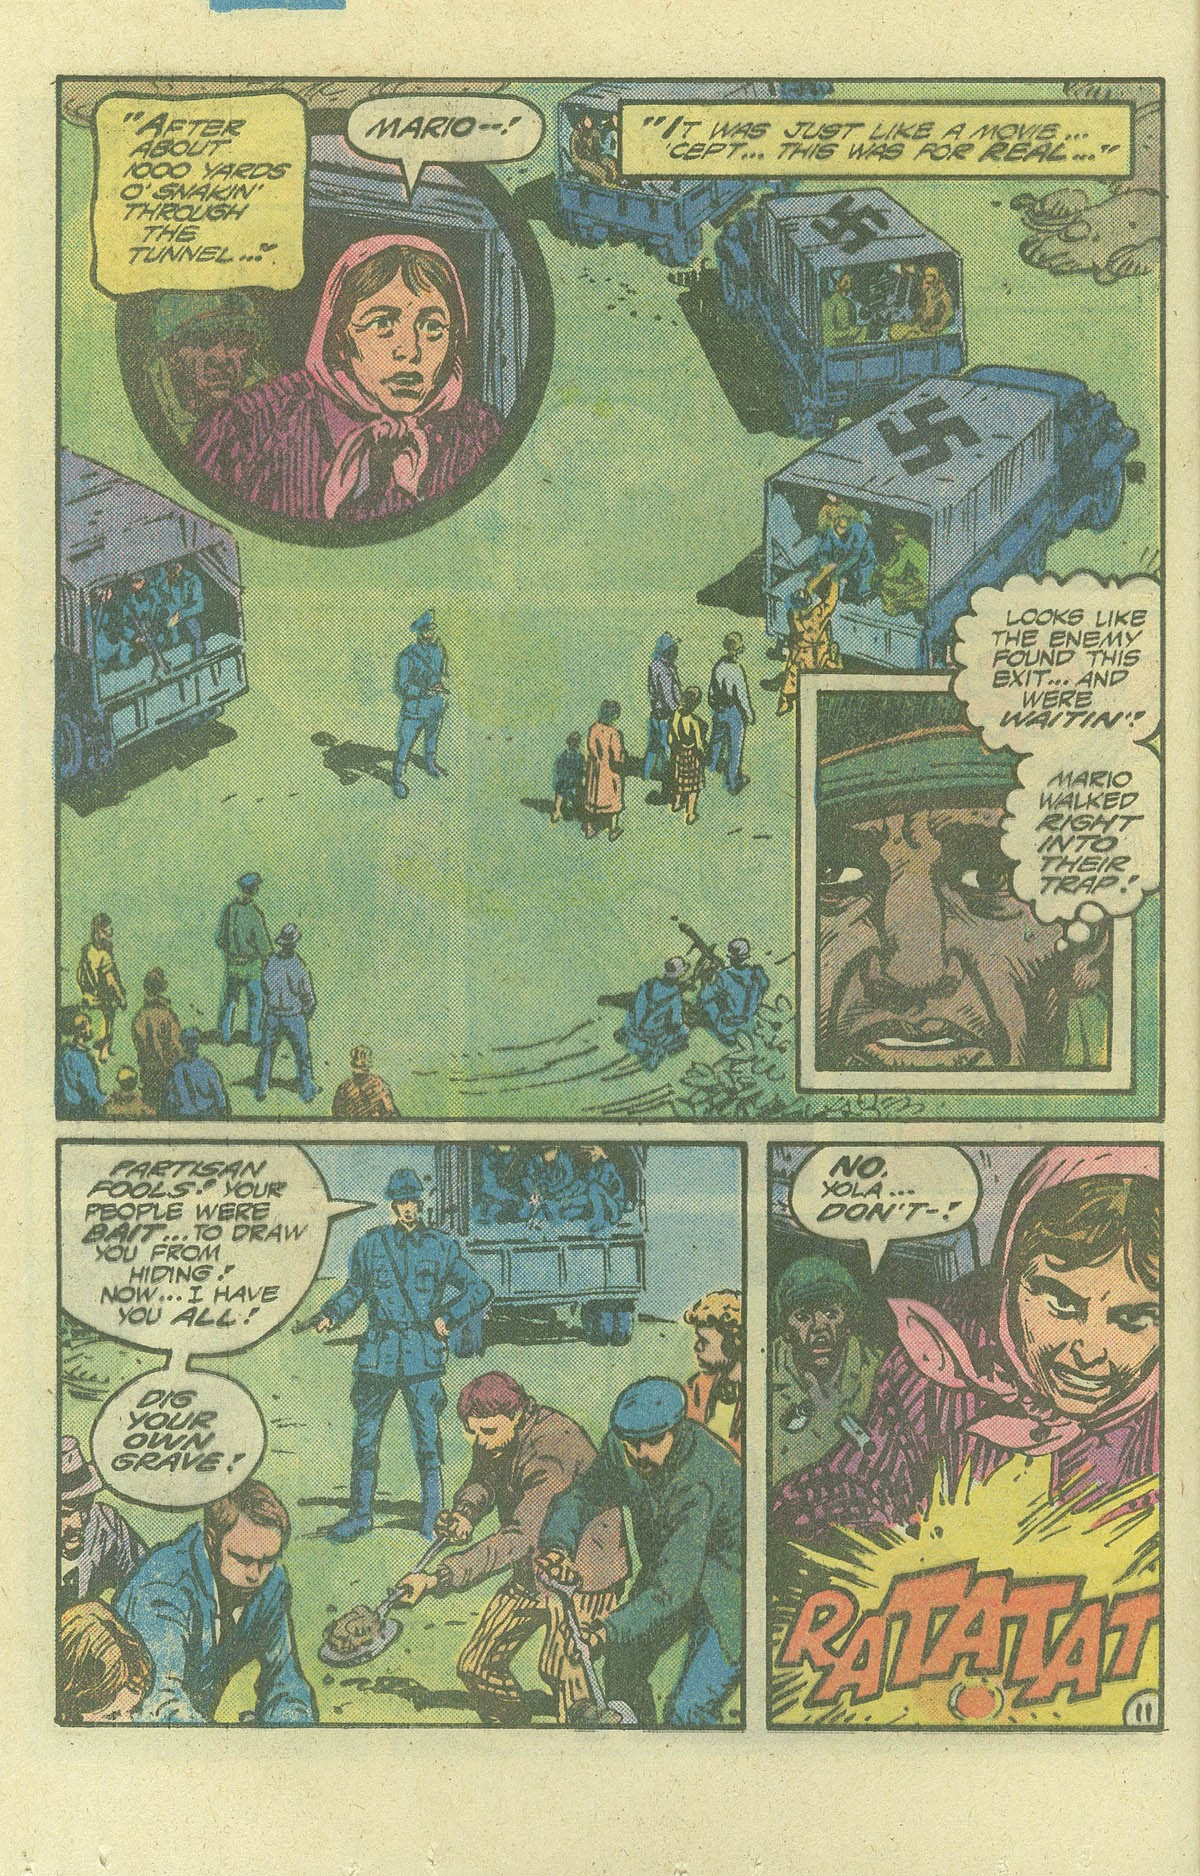 Read online Sgt. Rock comic -  Issue #386 - 11